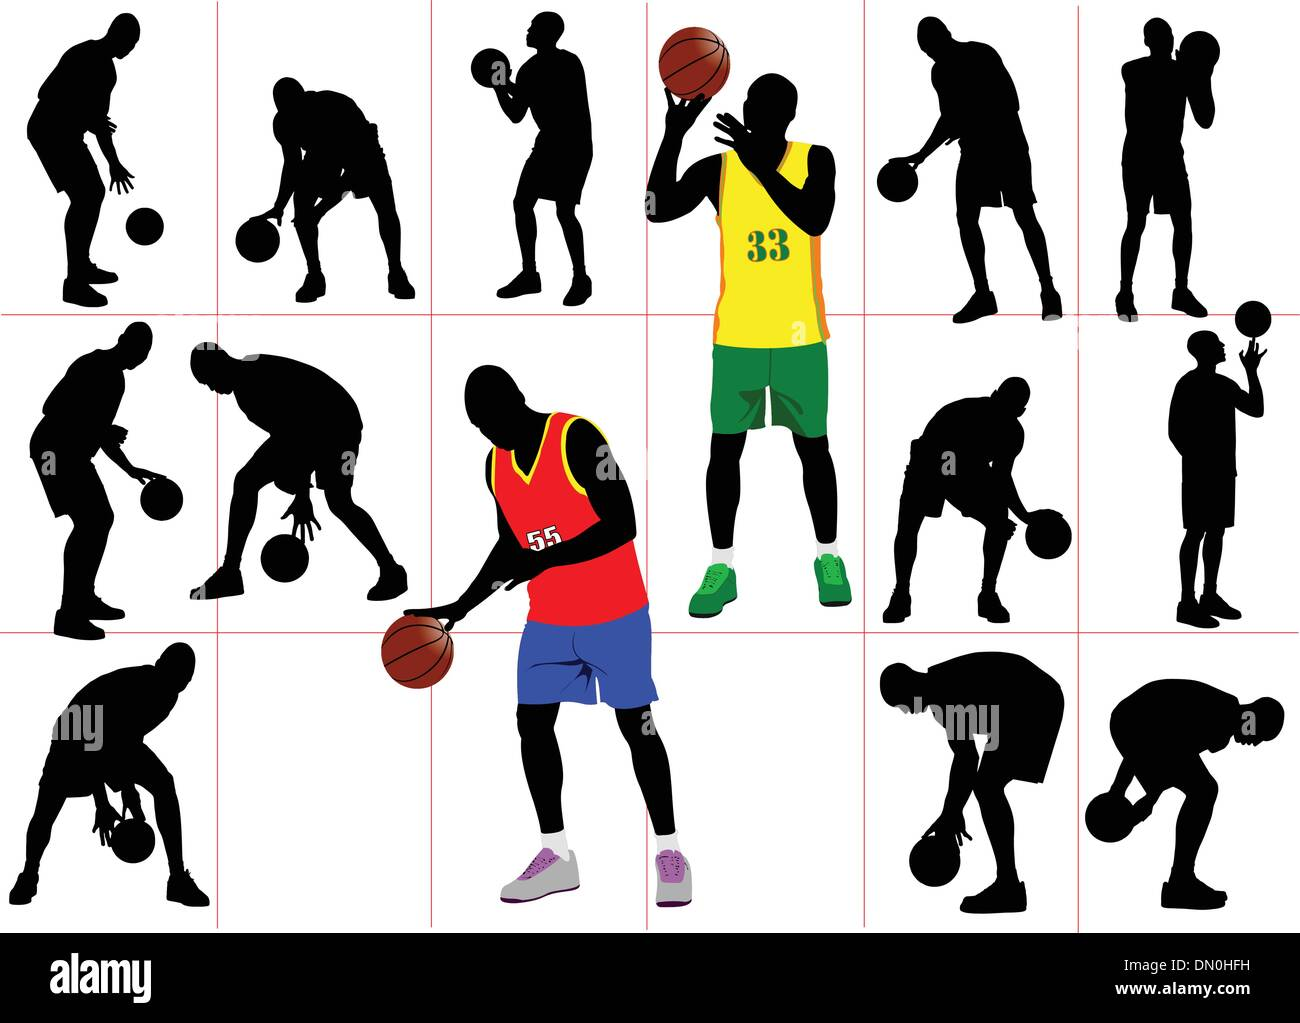 Póster de baloncesto. Ilustración vectorial Imagen De Stock